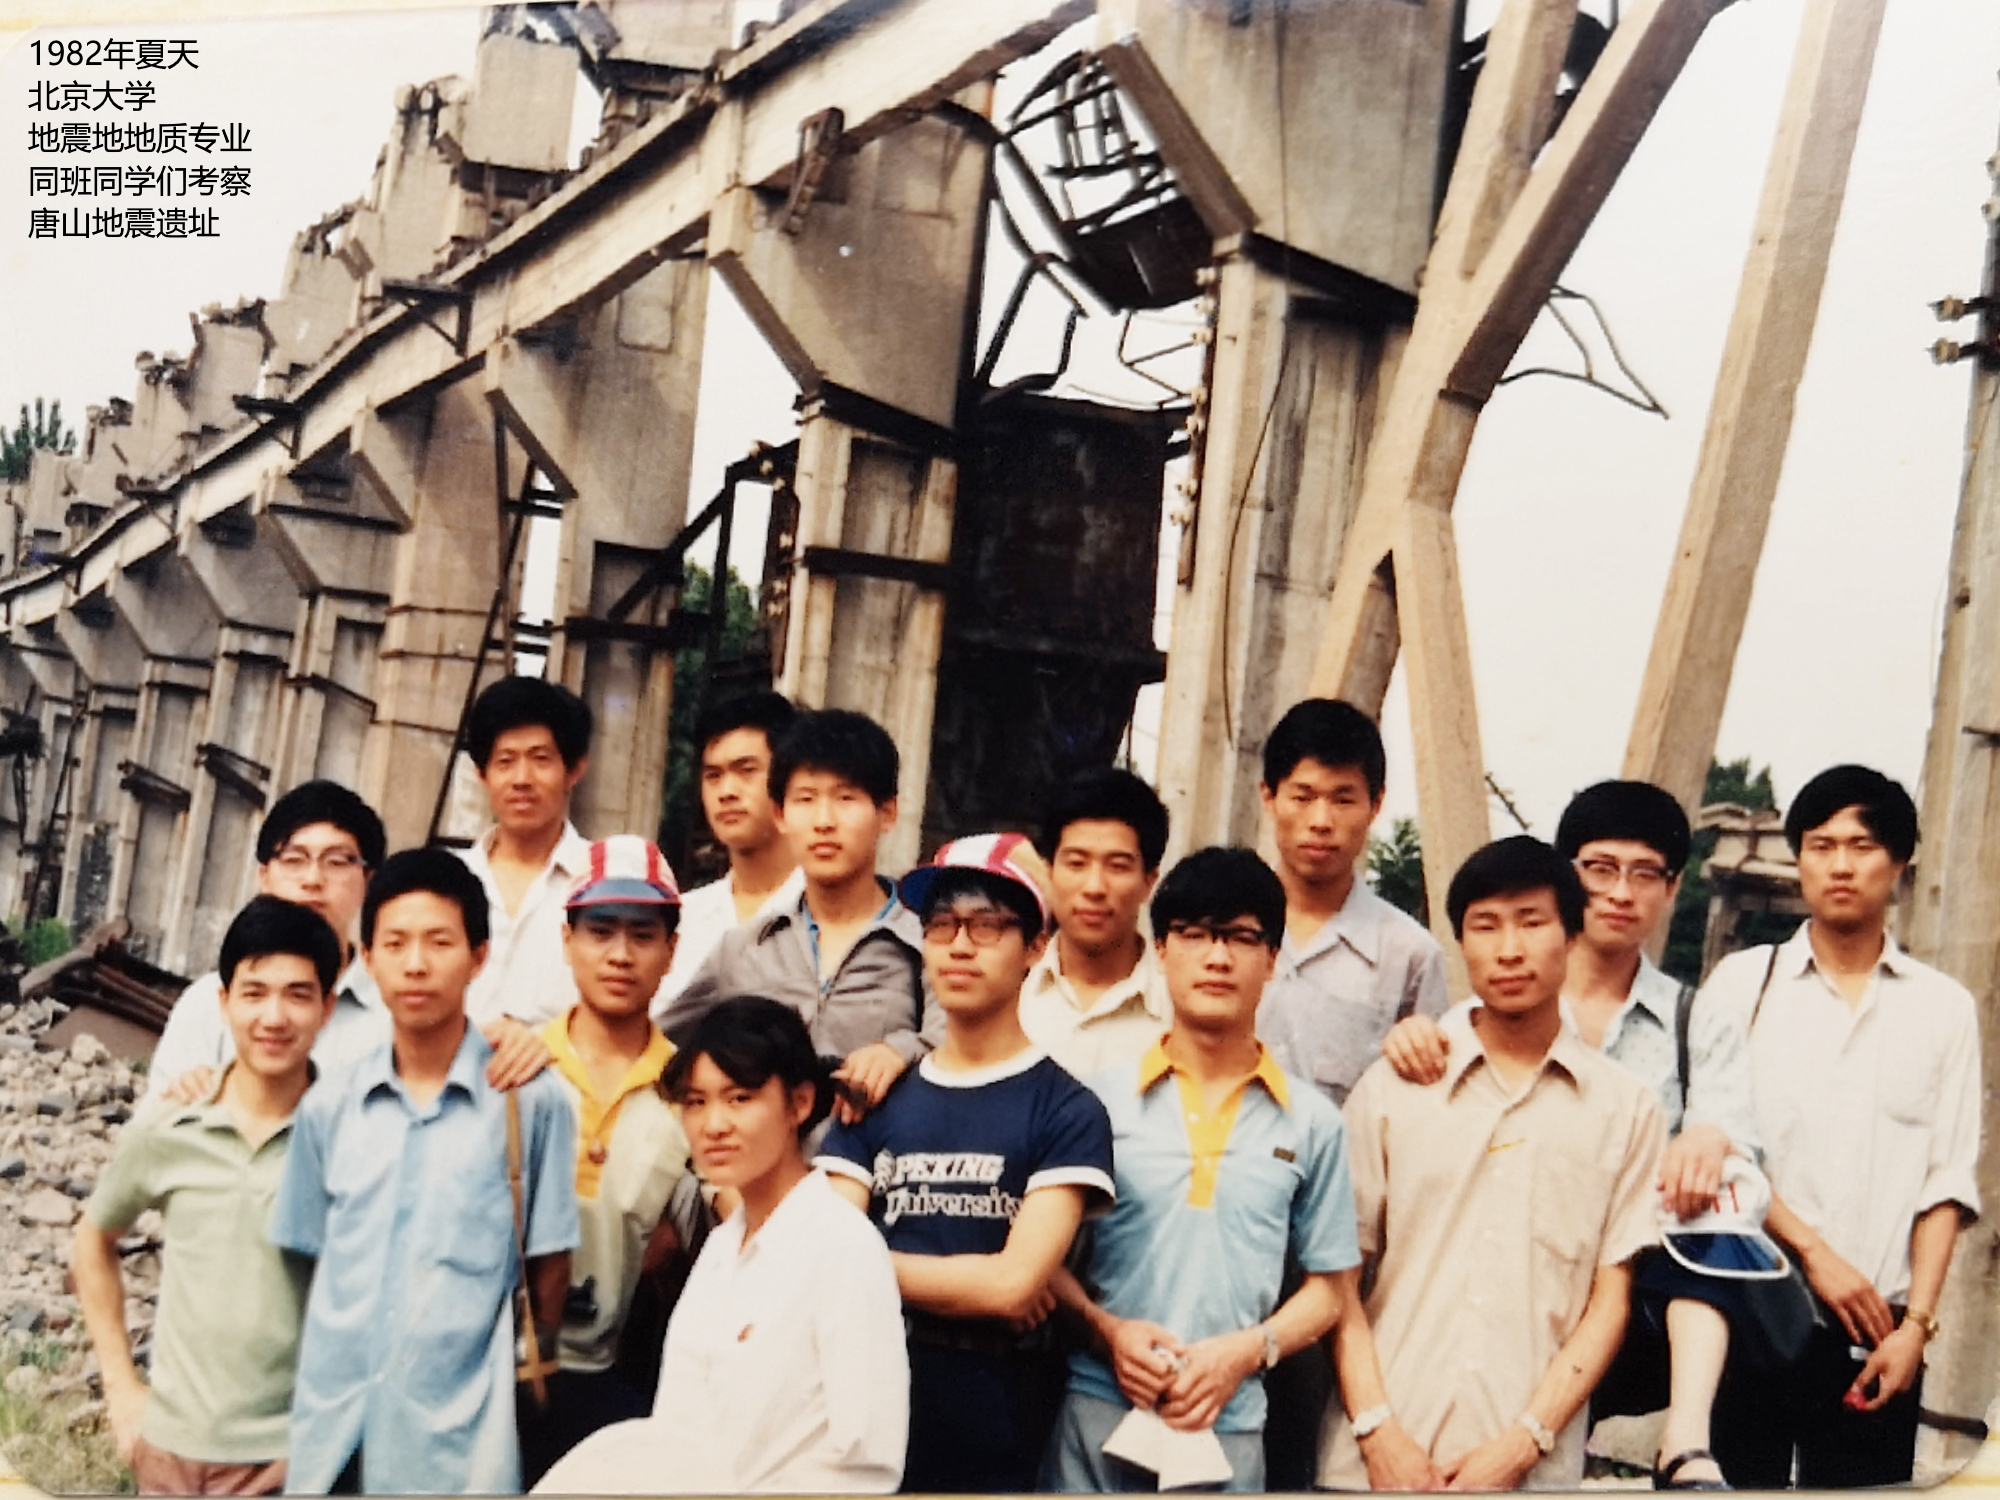 tangshan1982.jpg